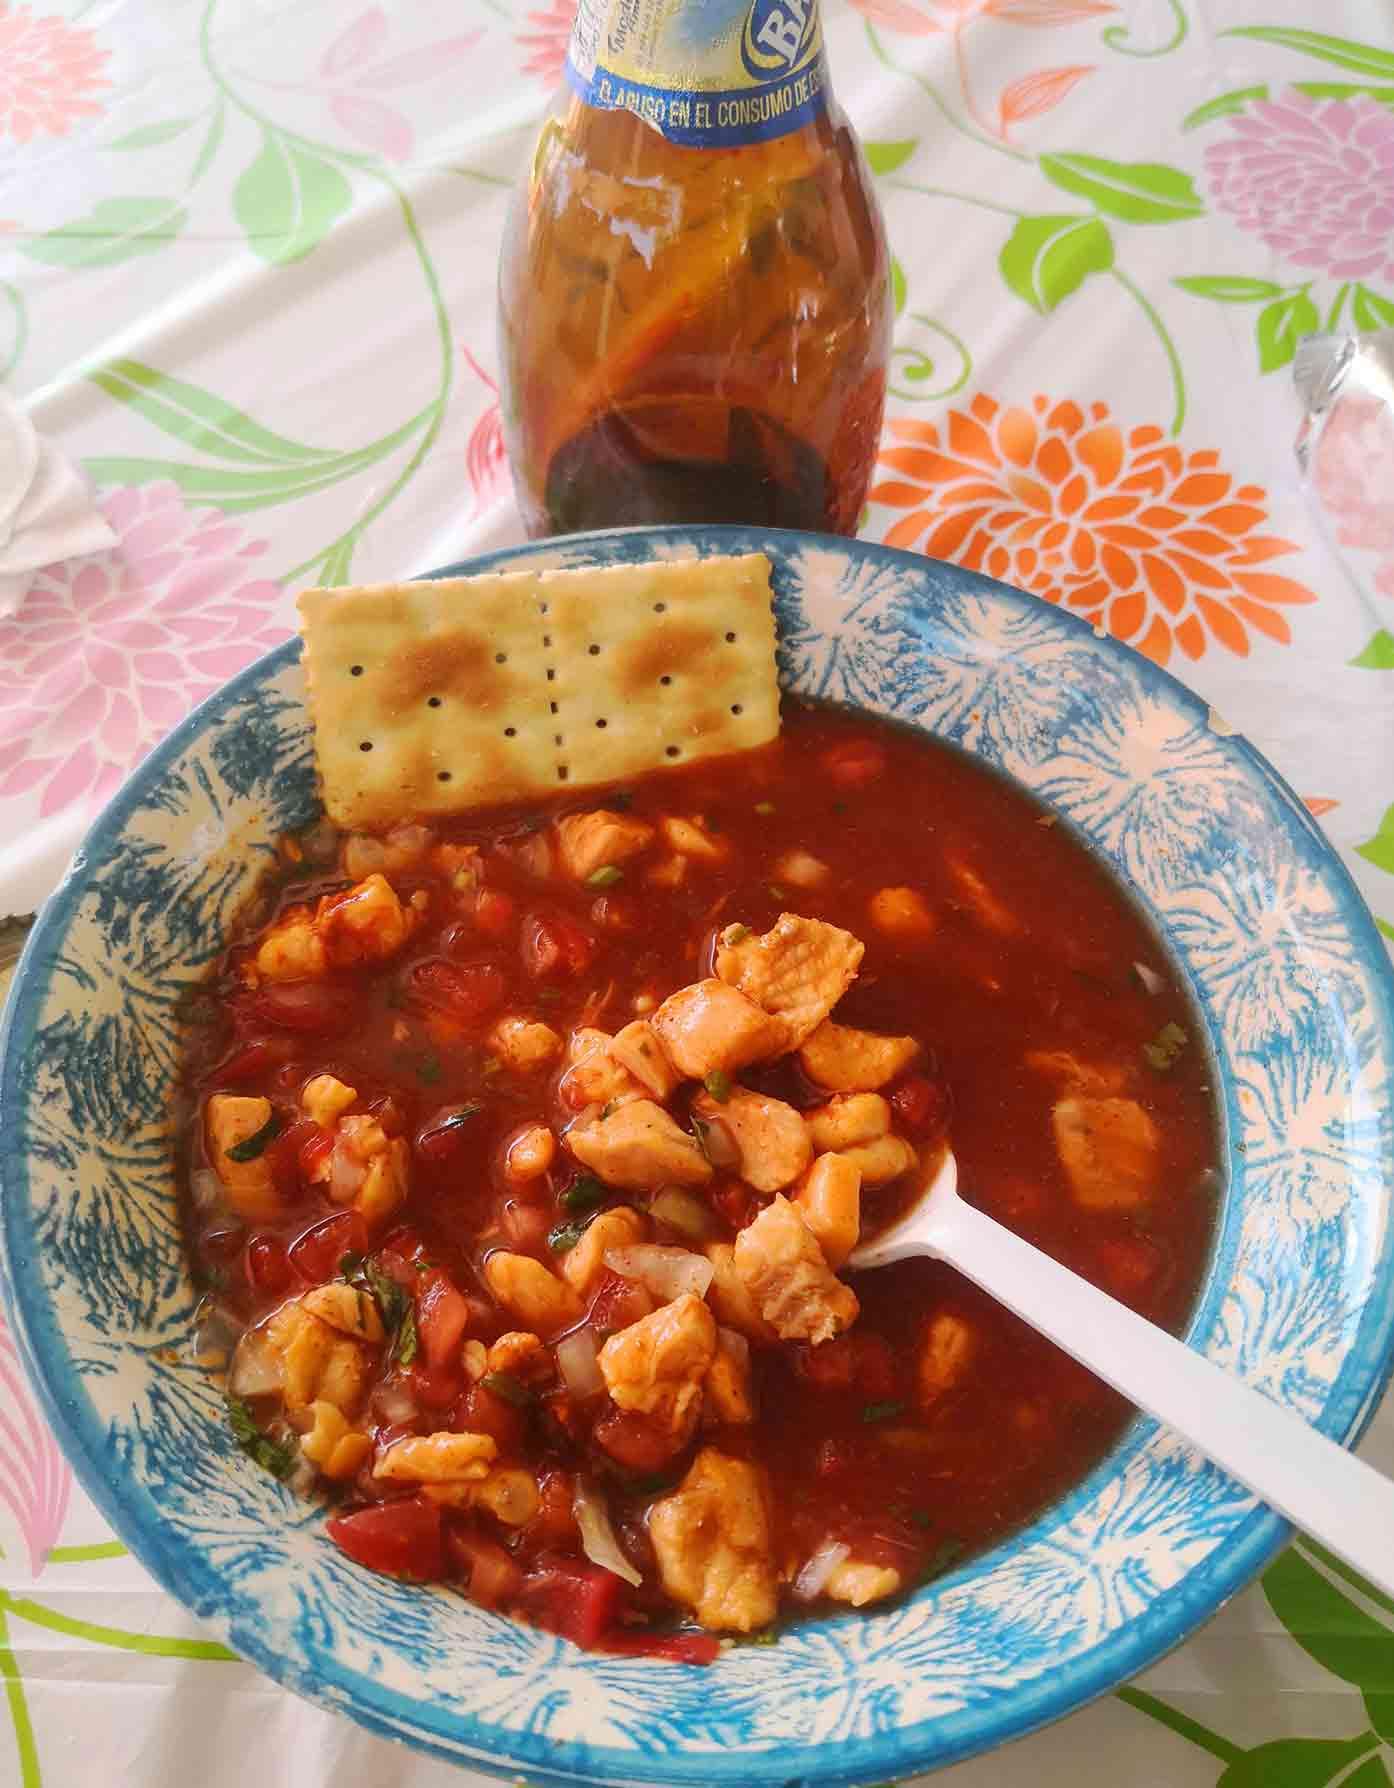 food in acapulco mexico